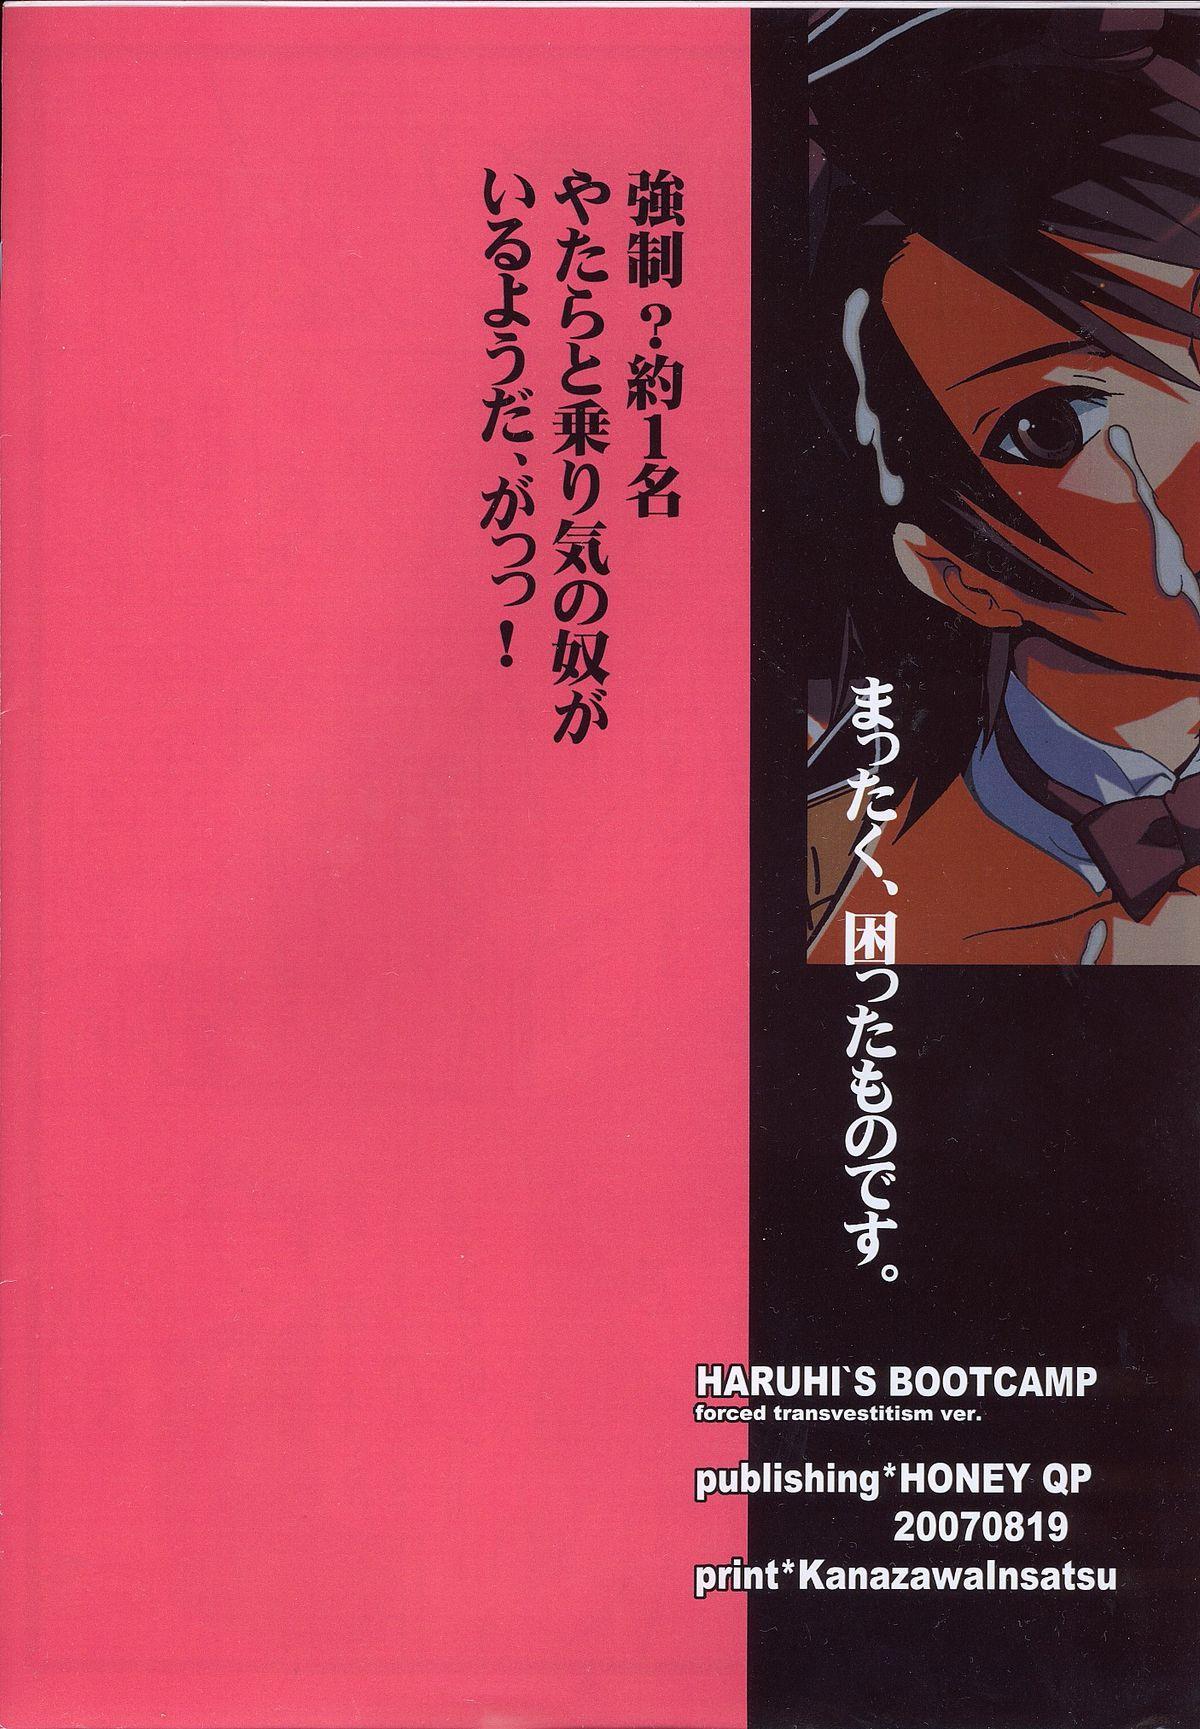 Haruhi's Bootcamp Kyousei Nyuutai Hen 9